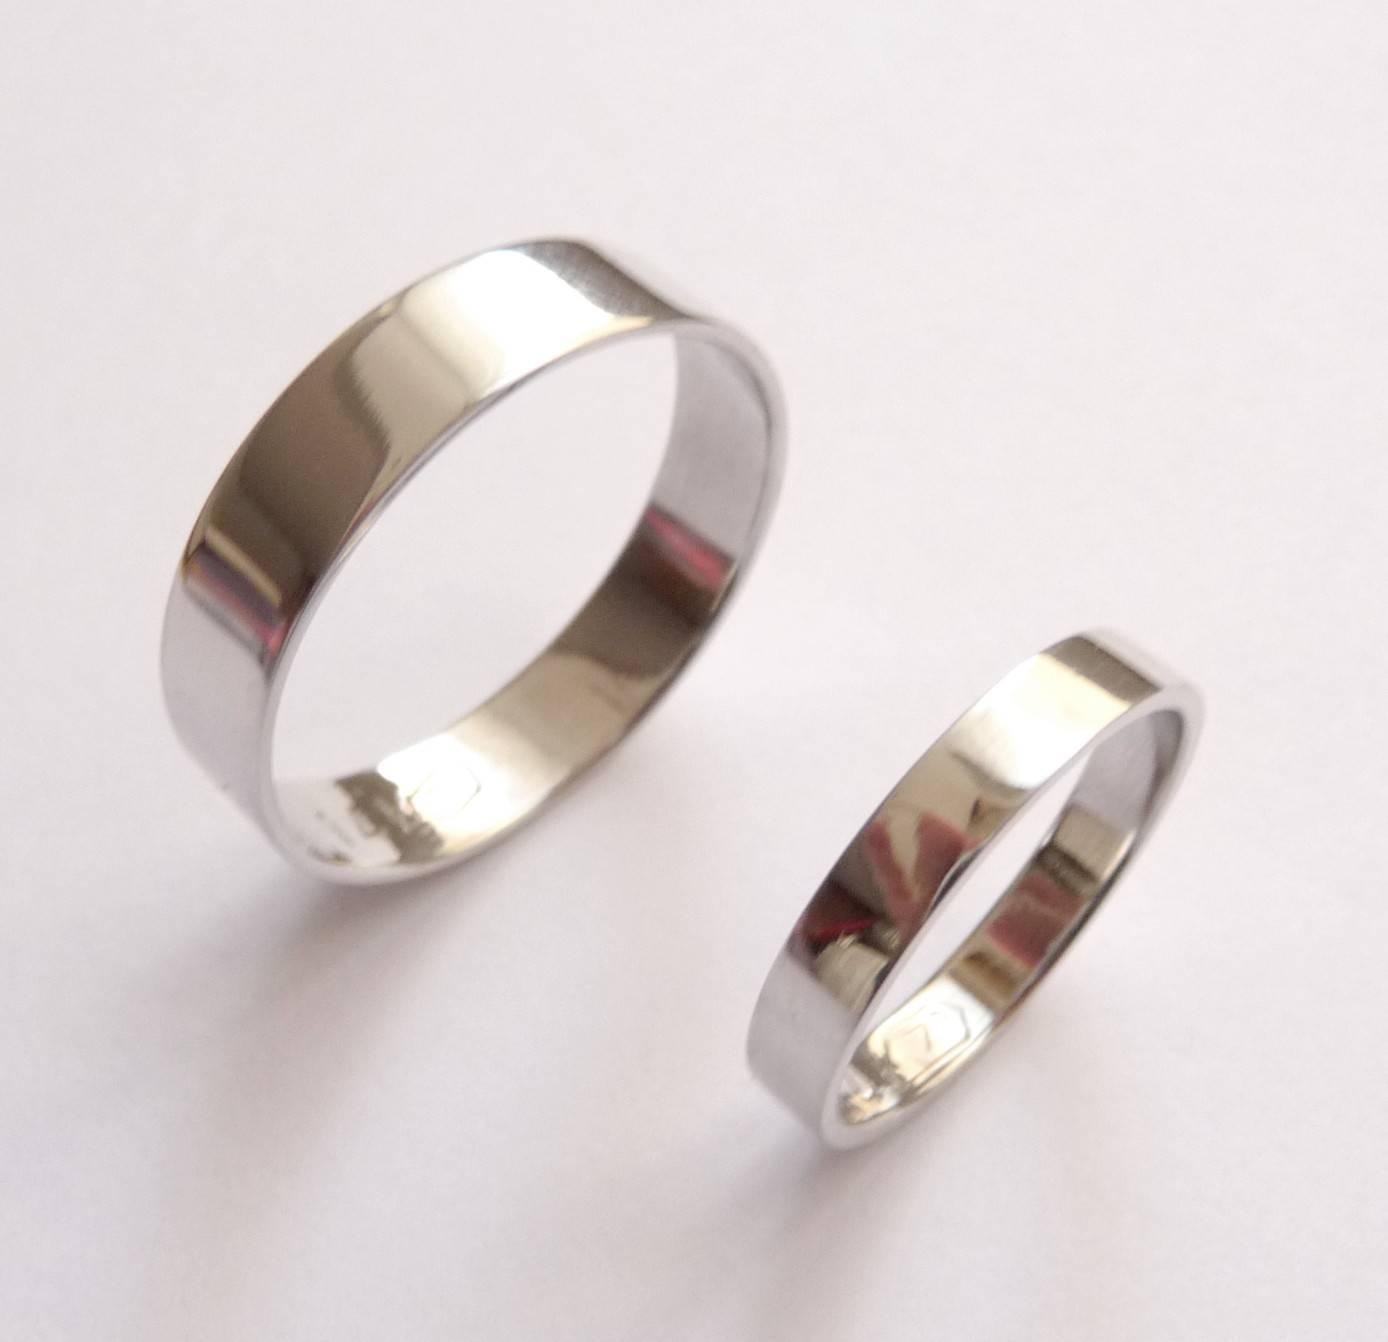 White Gold Wedding Band Set Women Wedding Ring Men Wedding Intended For Men And Women Wedding Bands Sets (View 9 of 15)